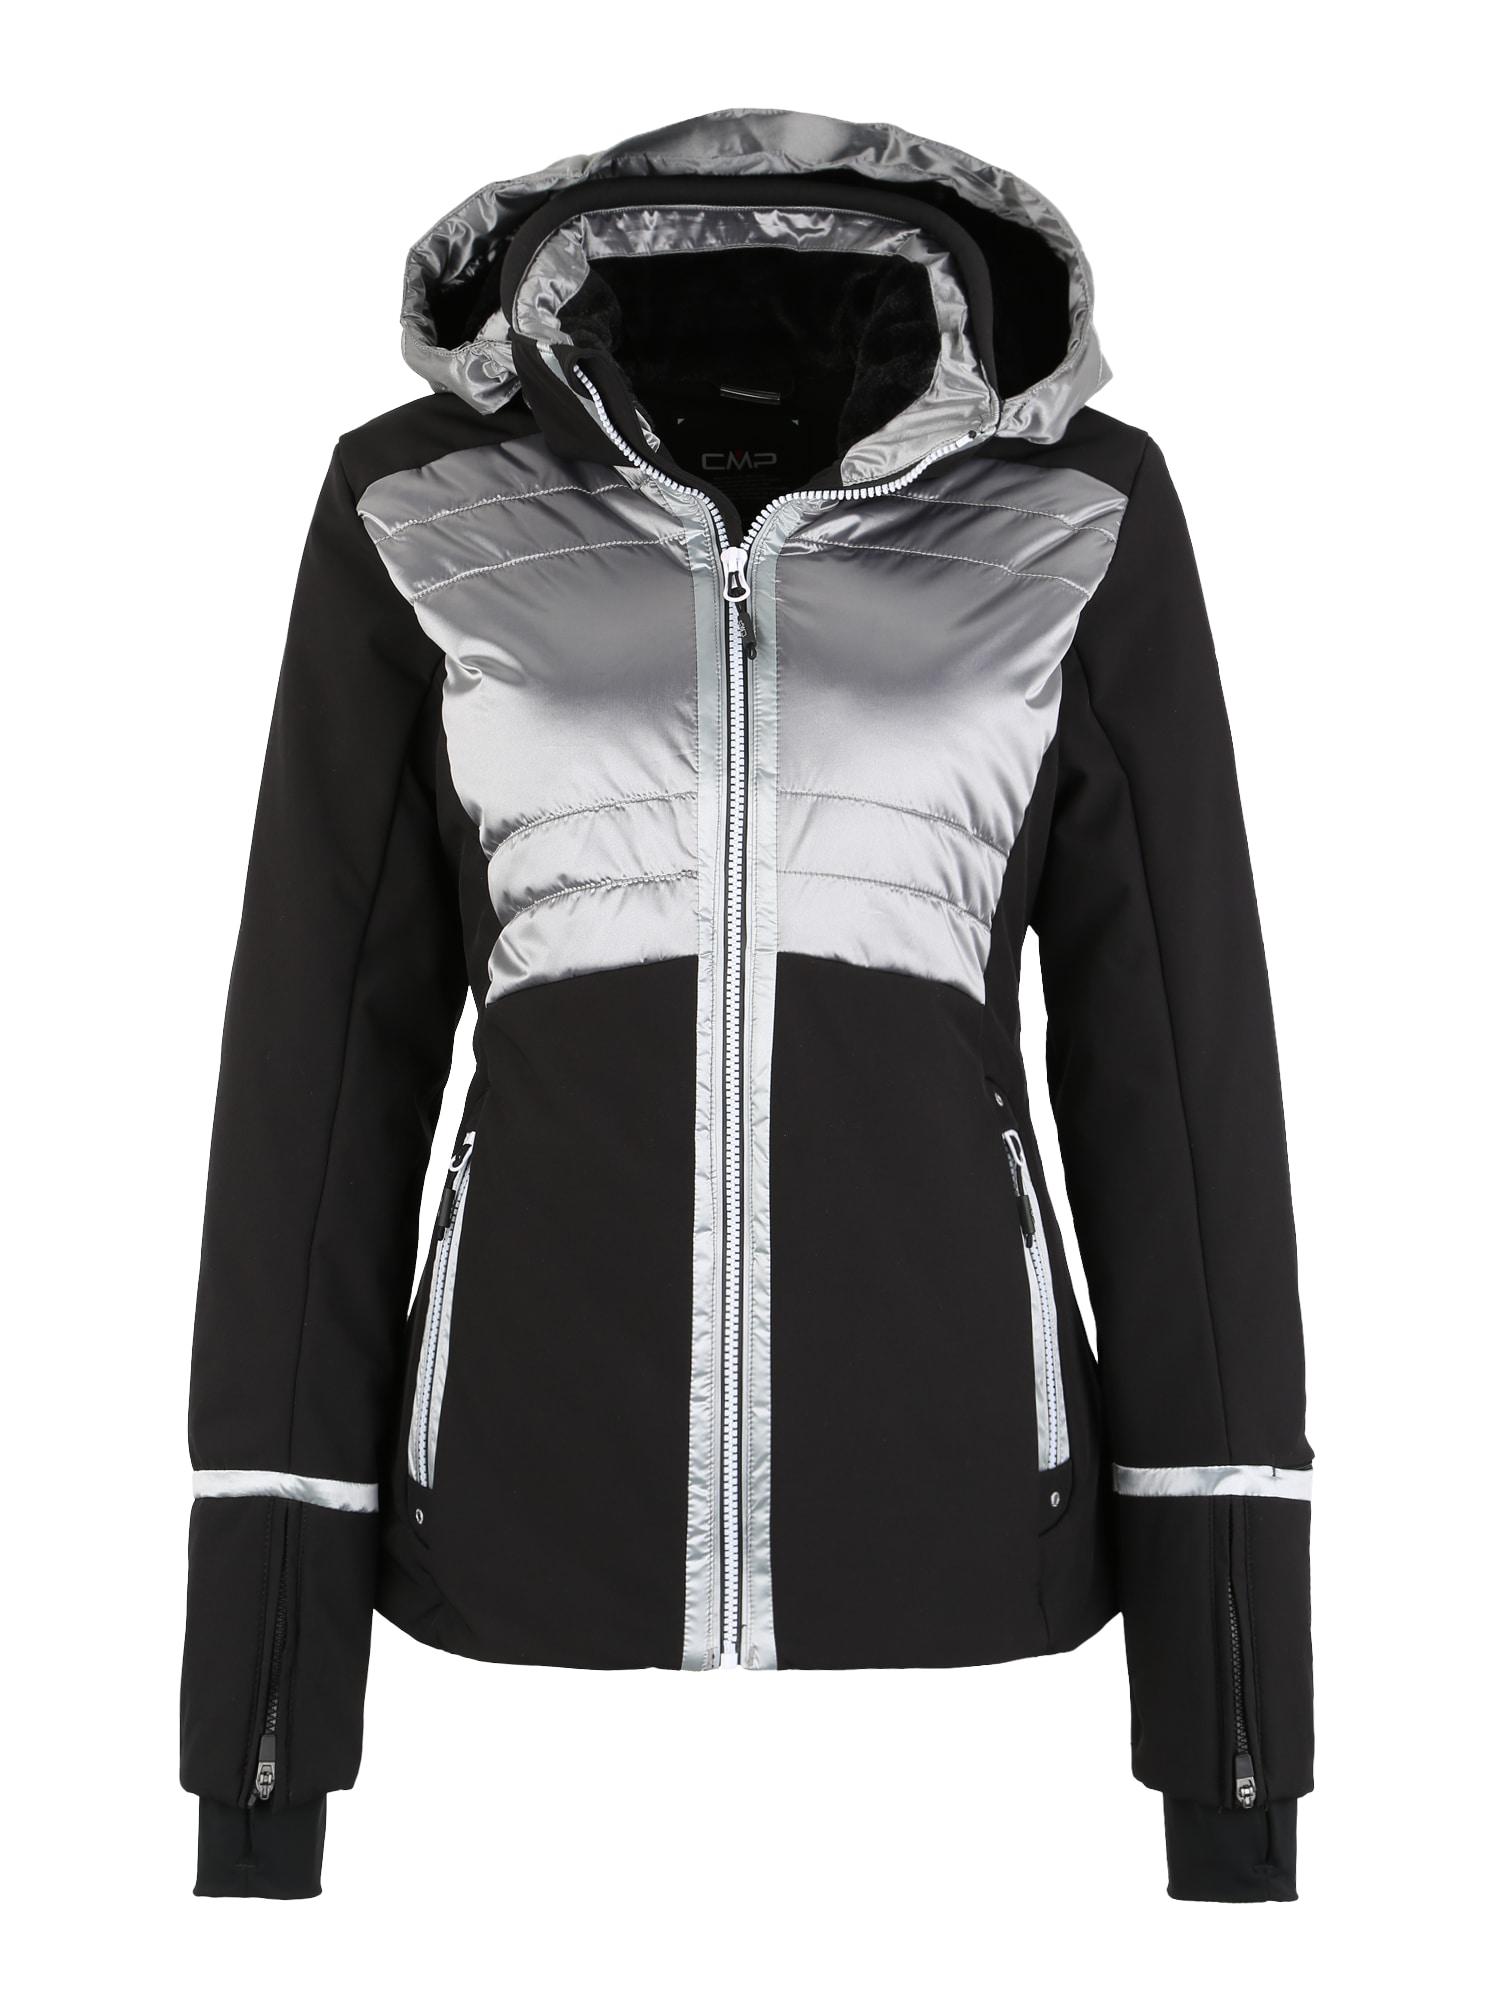 Outdoorová bunda černá stříbrná CMP